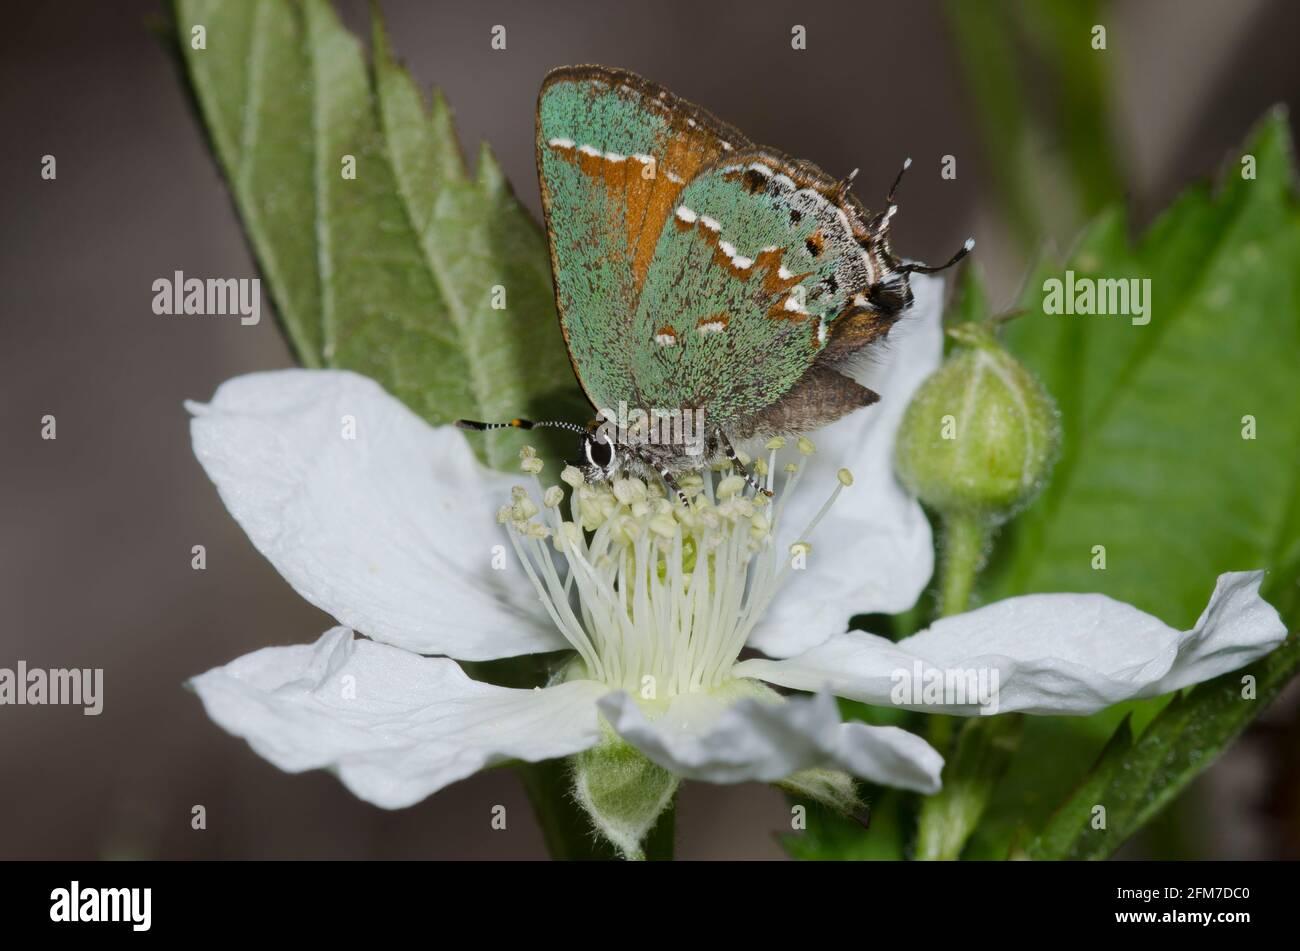 Juniper Hairstreak, Callophrys gryneus, nectaring de BlackBerry, Rubus sp. Foto de stock